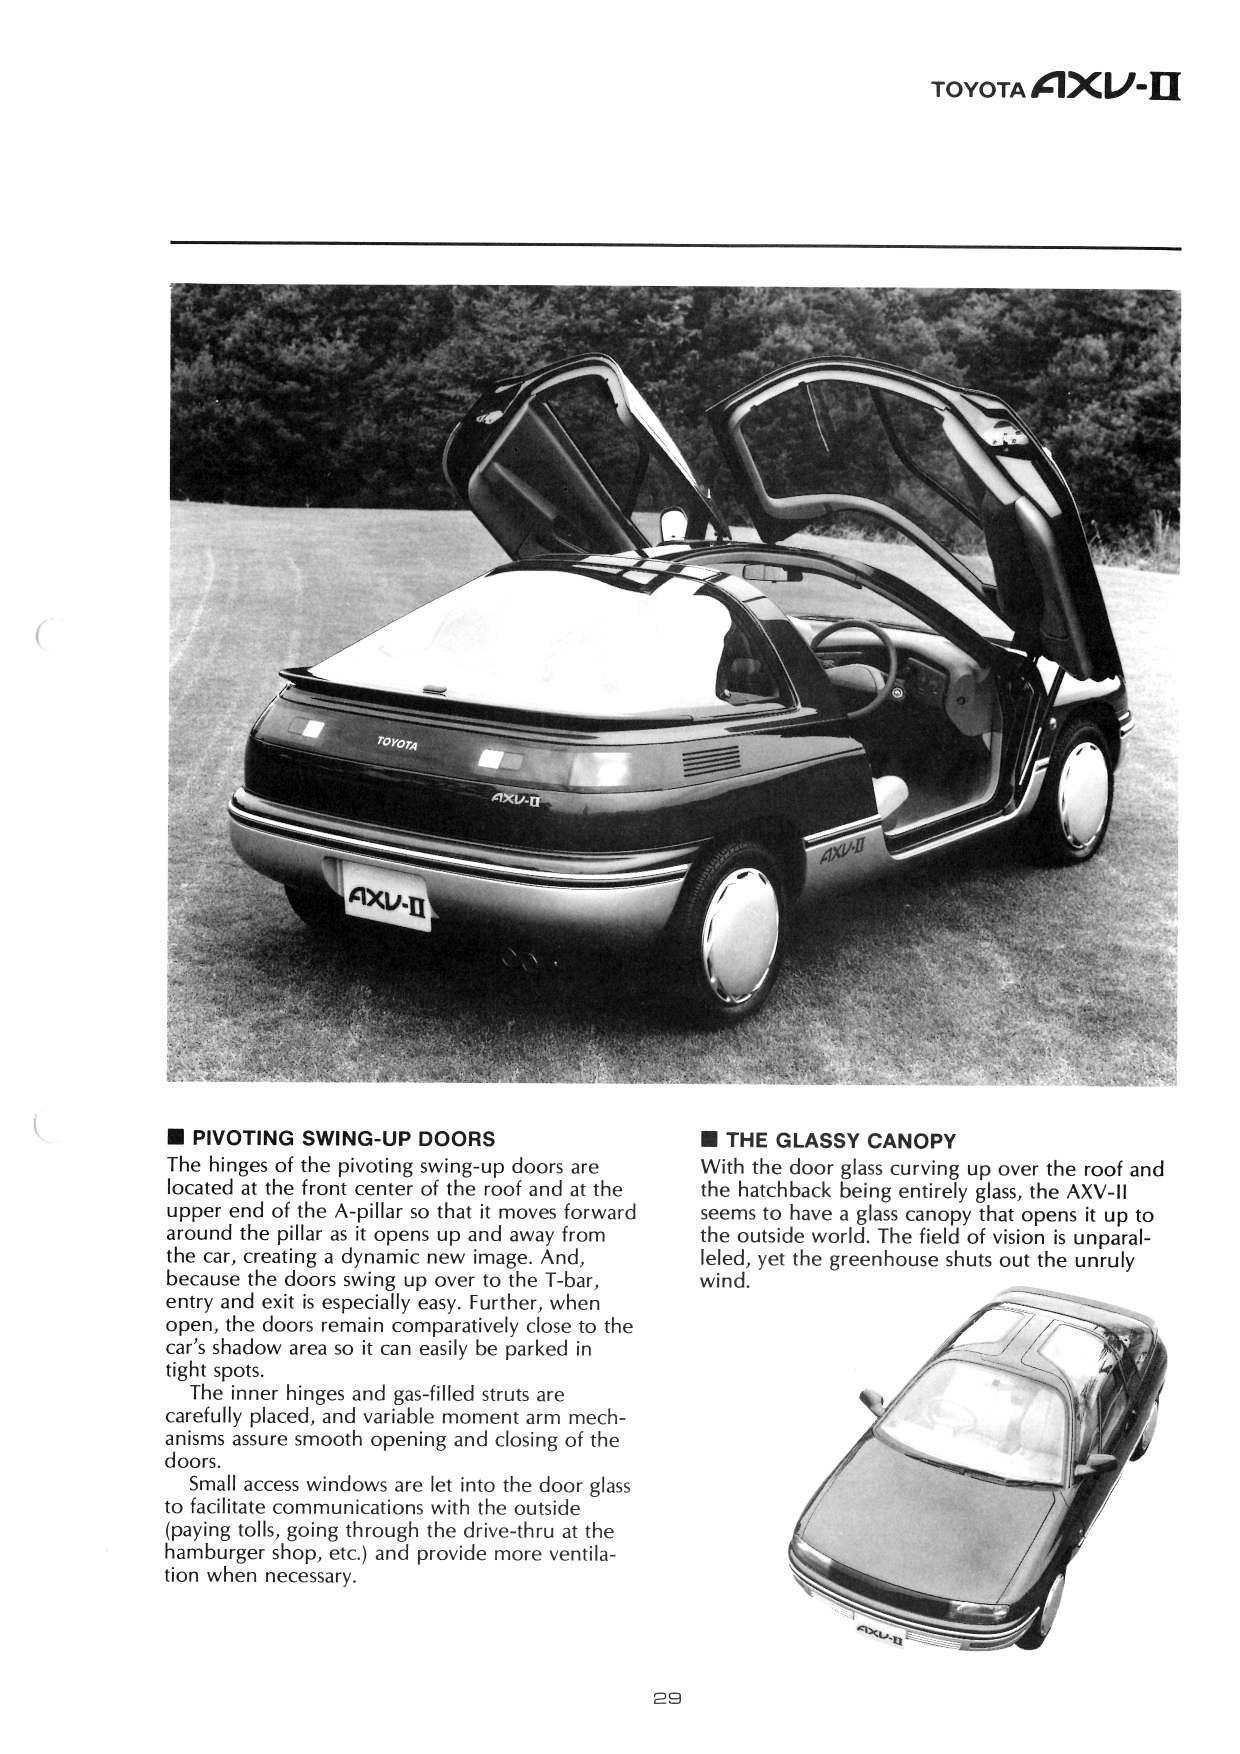 1987 Toyota Axv Ii Concepts